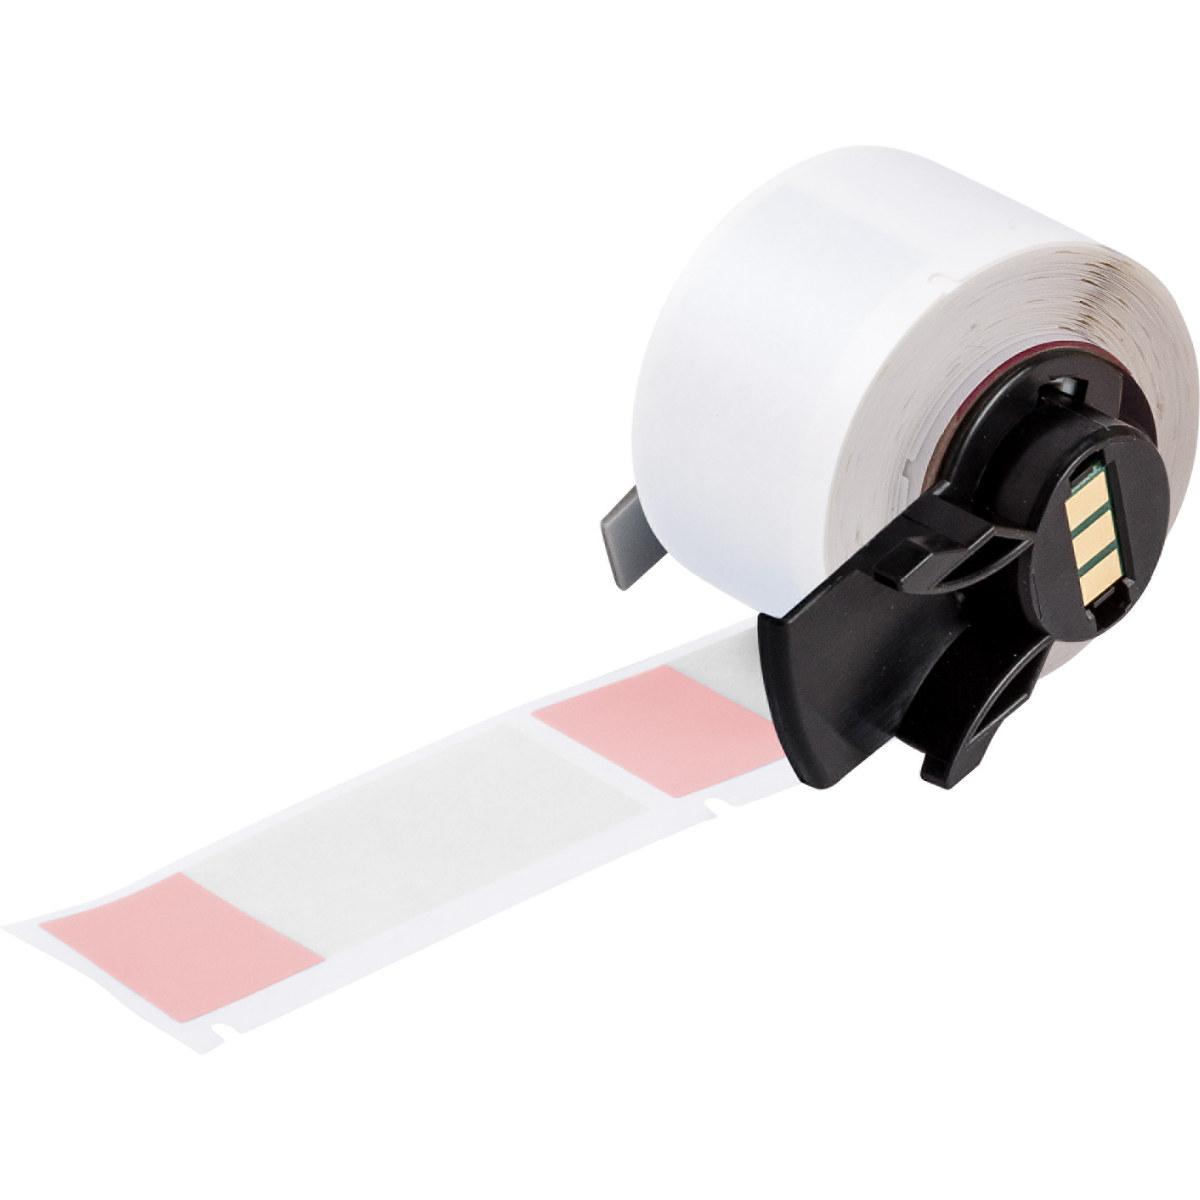 Brady PTL-21-427-RD Die-Cut Printer Label Roll, 1 in x 2 1/2